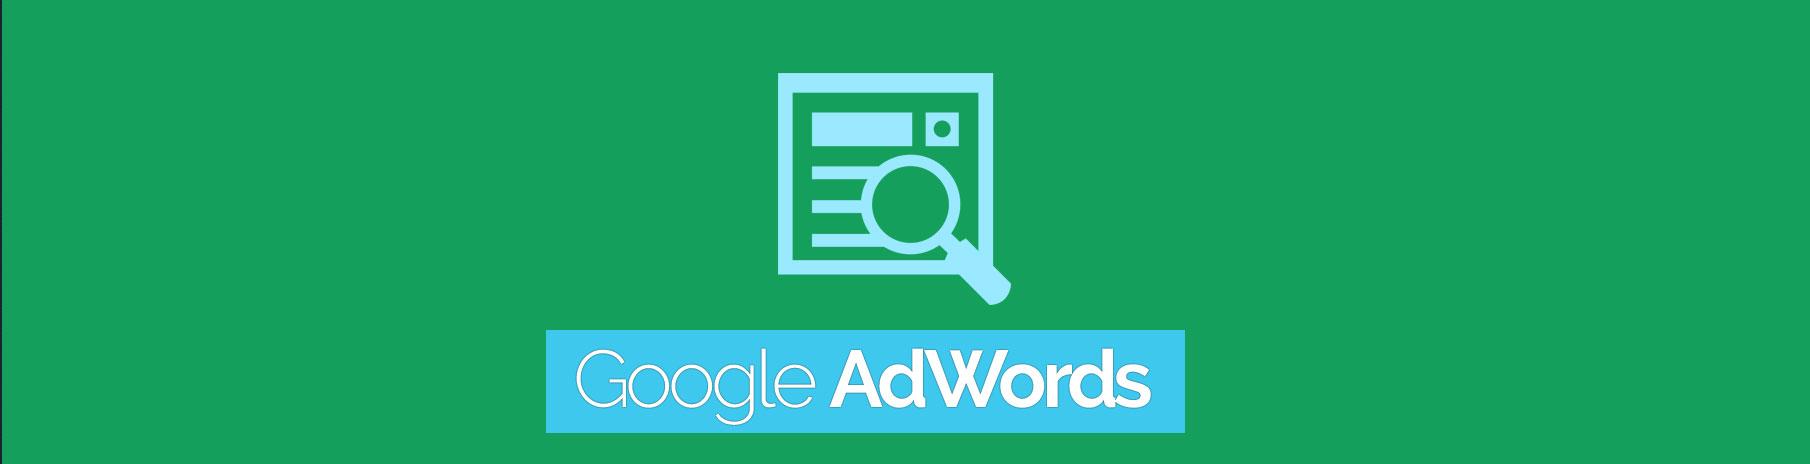 PPC Google adwords certified company in Belfast Northern Ireland